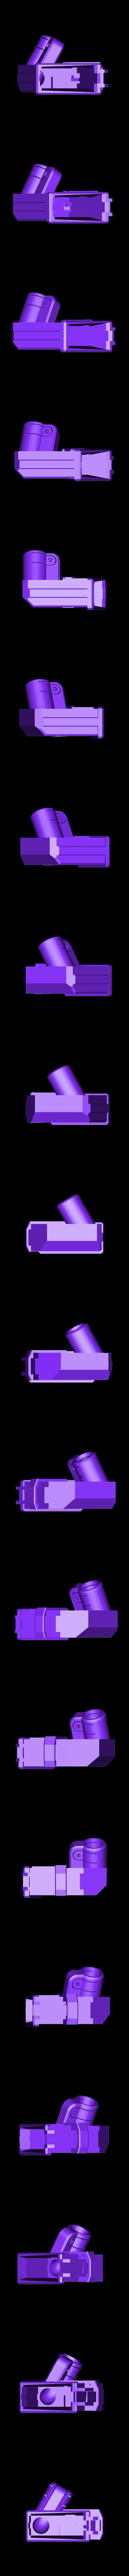 TMC_magwell_M3_L.stl Download free STL file Tippmann TMC Mag Adapter Maverick, Trracer pump paintball • Object to 3D print, UntangleART